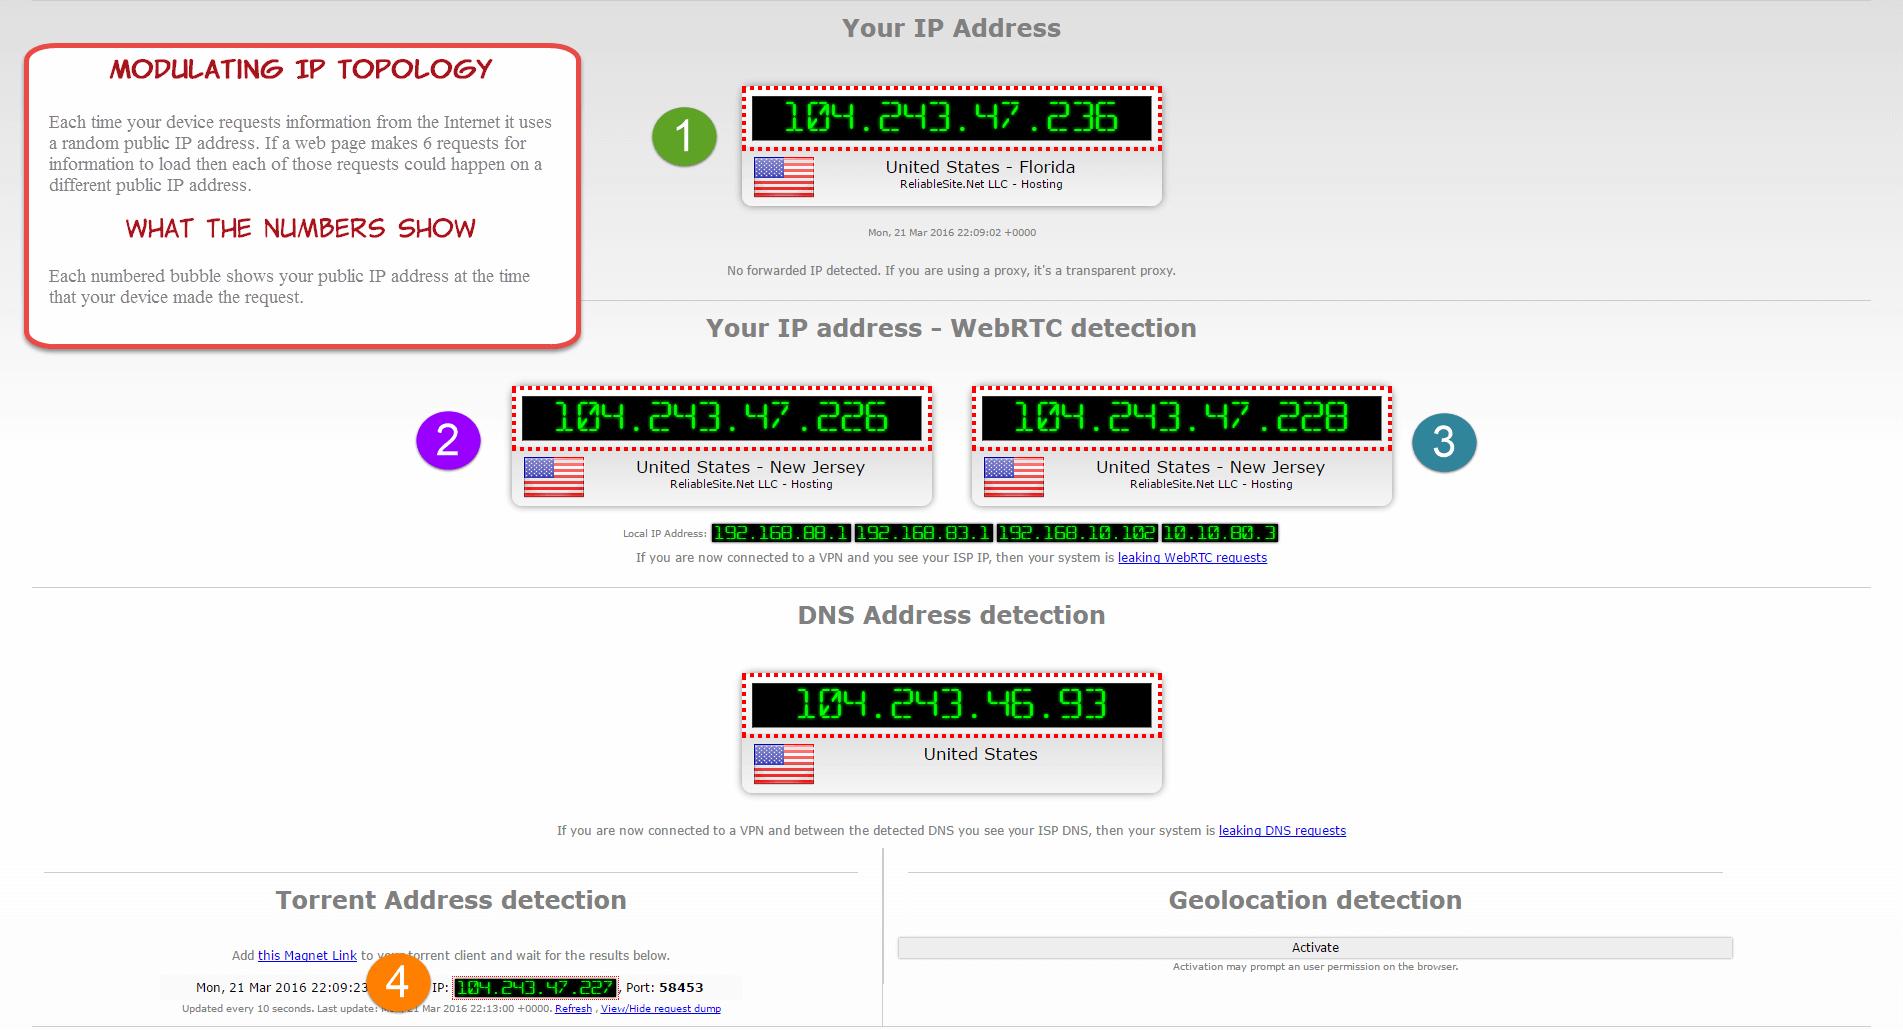 LiquidVPN: The Most Trusted VPN For Torrenting, Kodi, Blocked